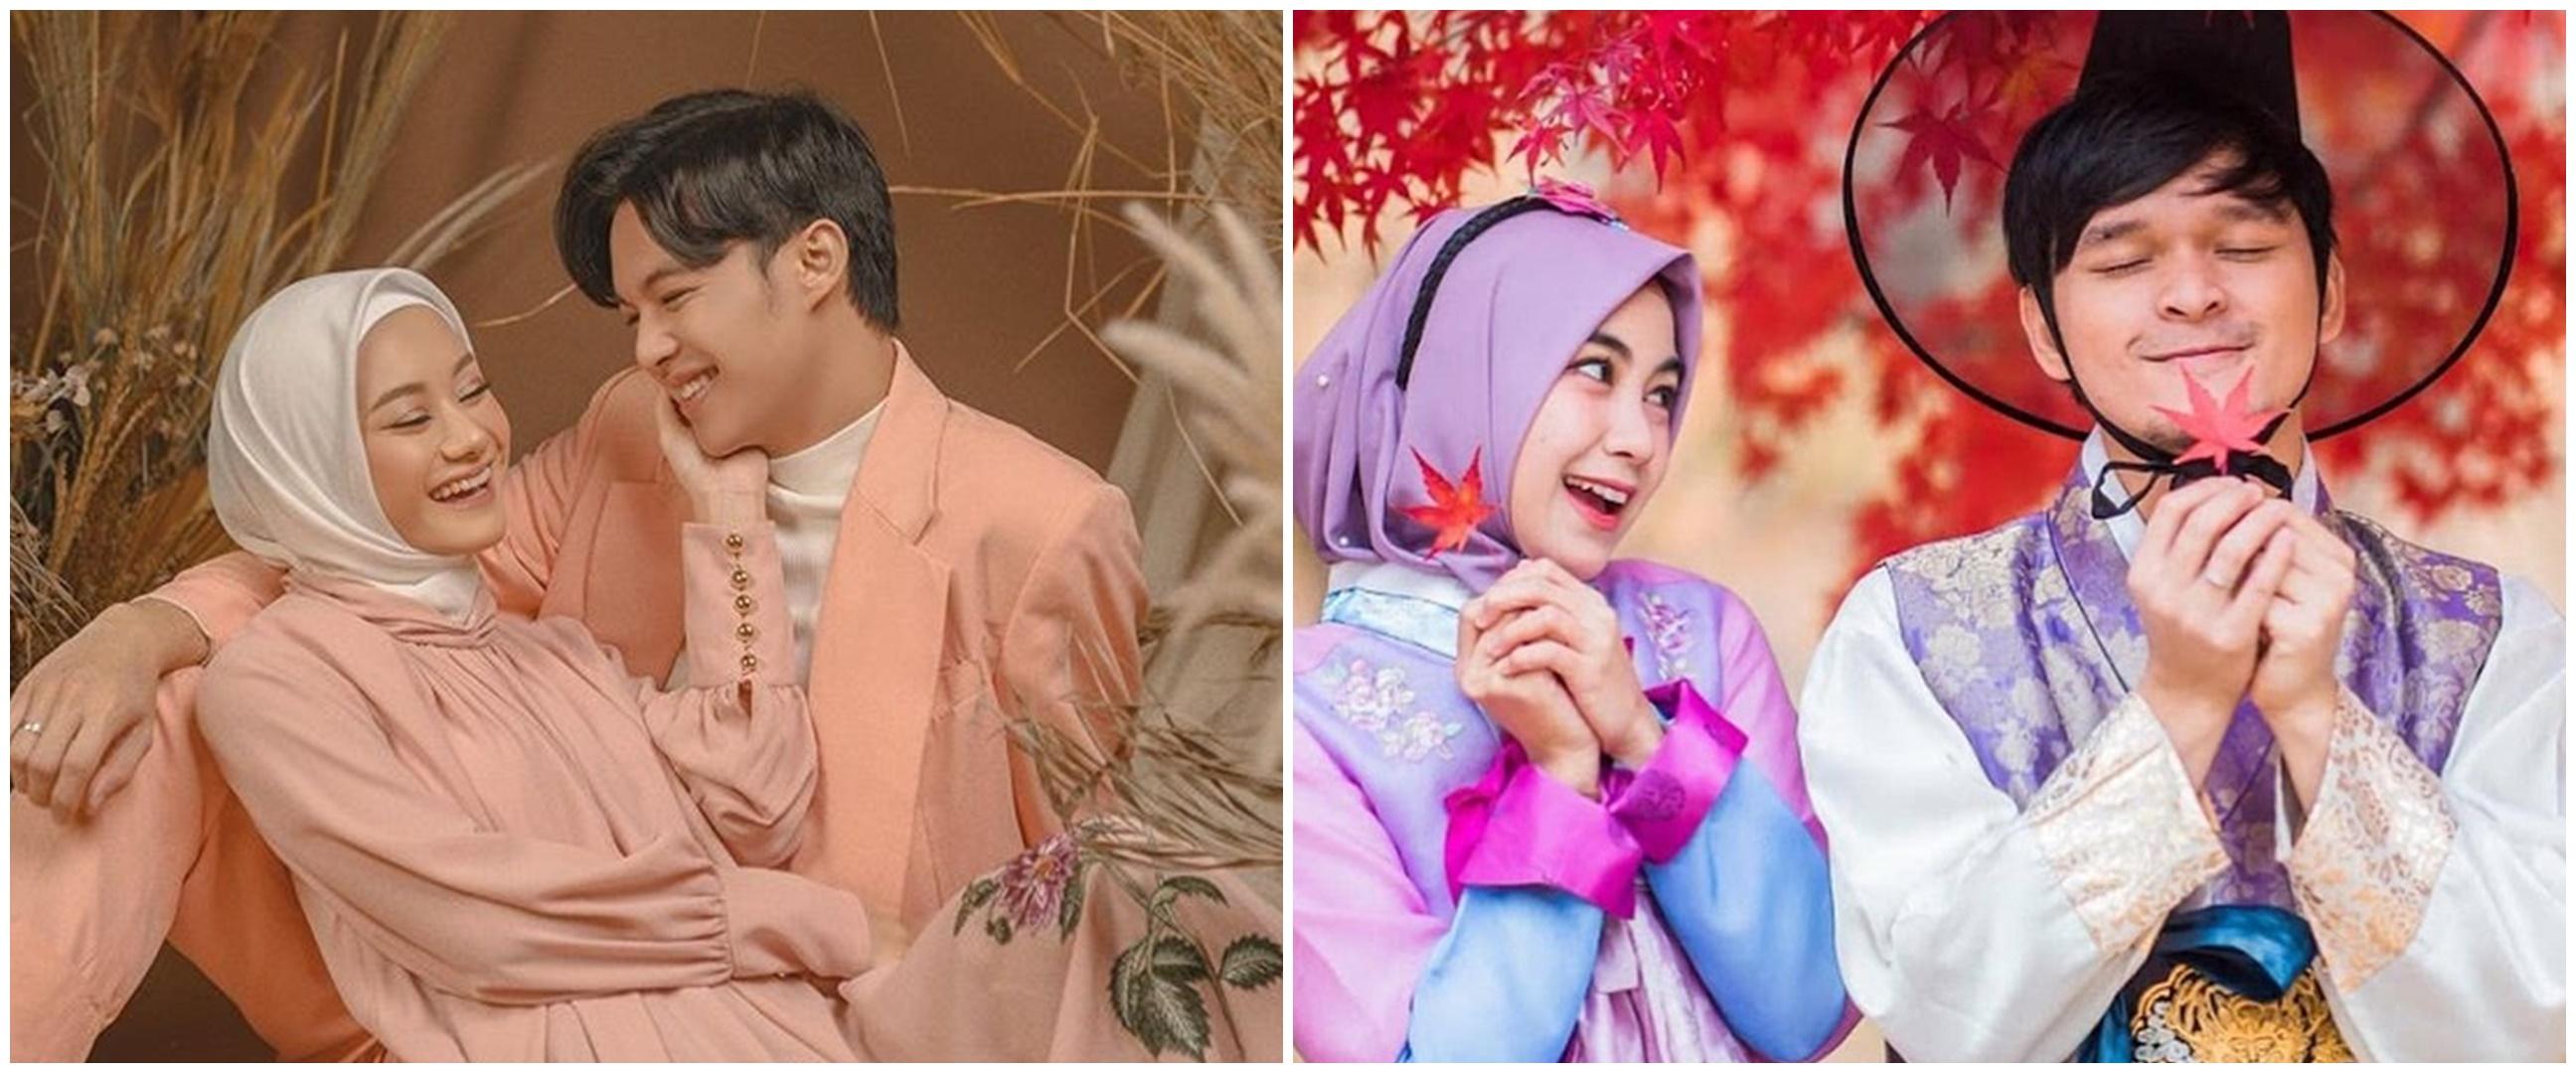 Post wedding 8 pasangan seleb yang menikah lewat taaruf, romantis